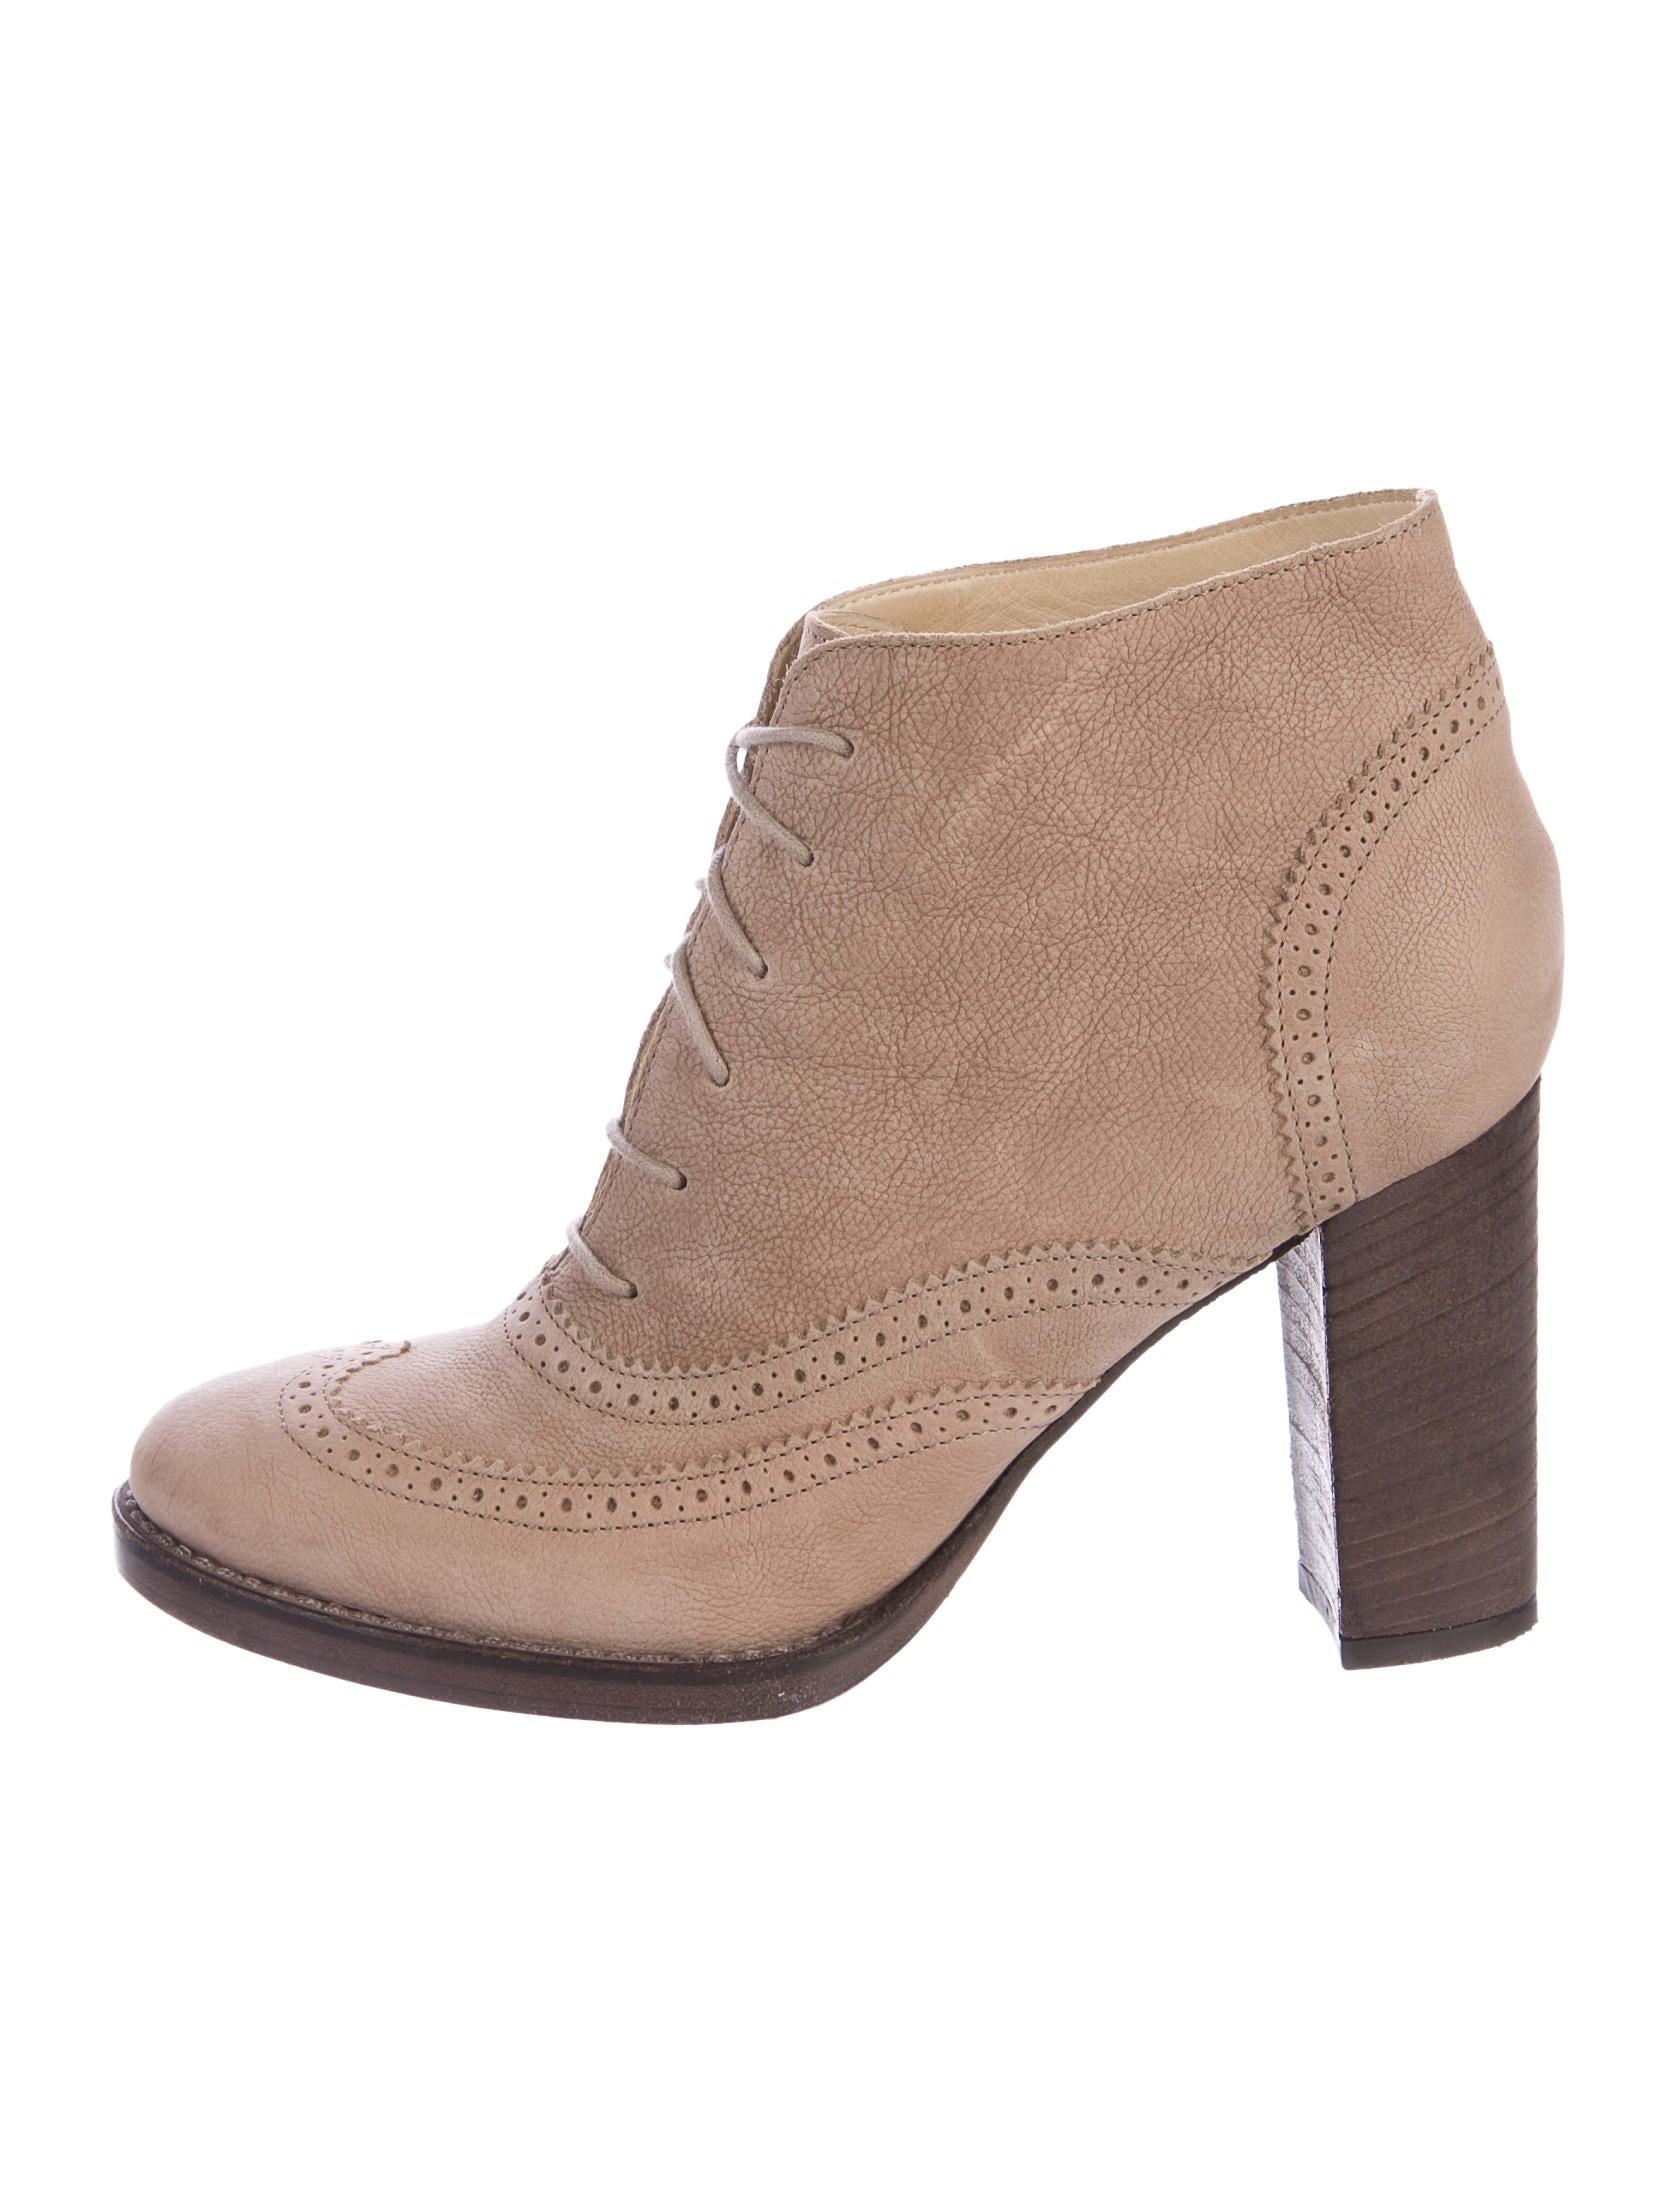 brunello cucinelli suede oxford booties shoes bru48998